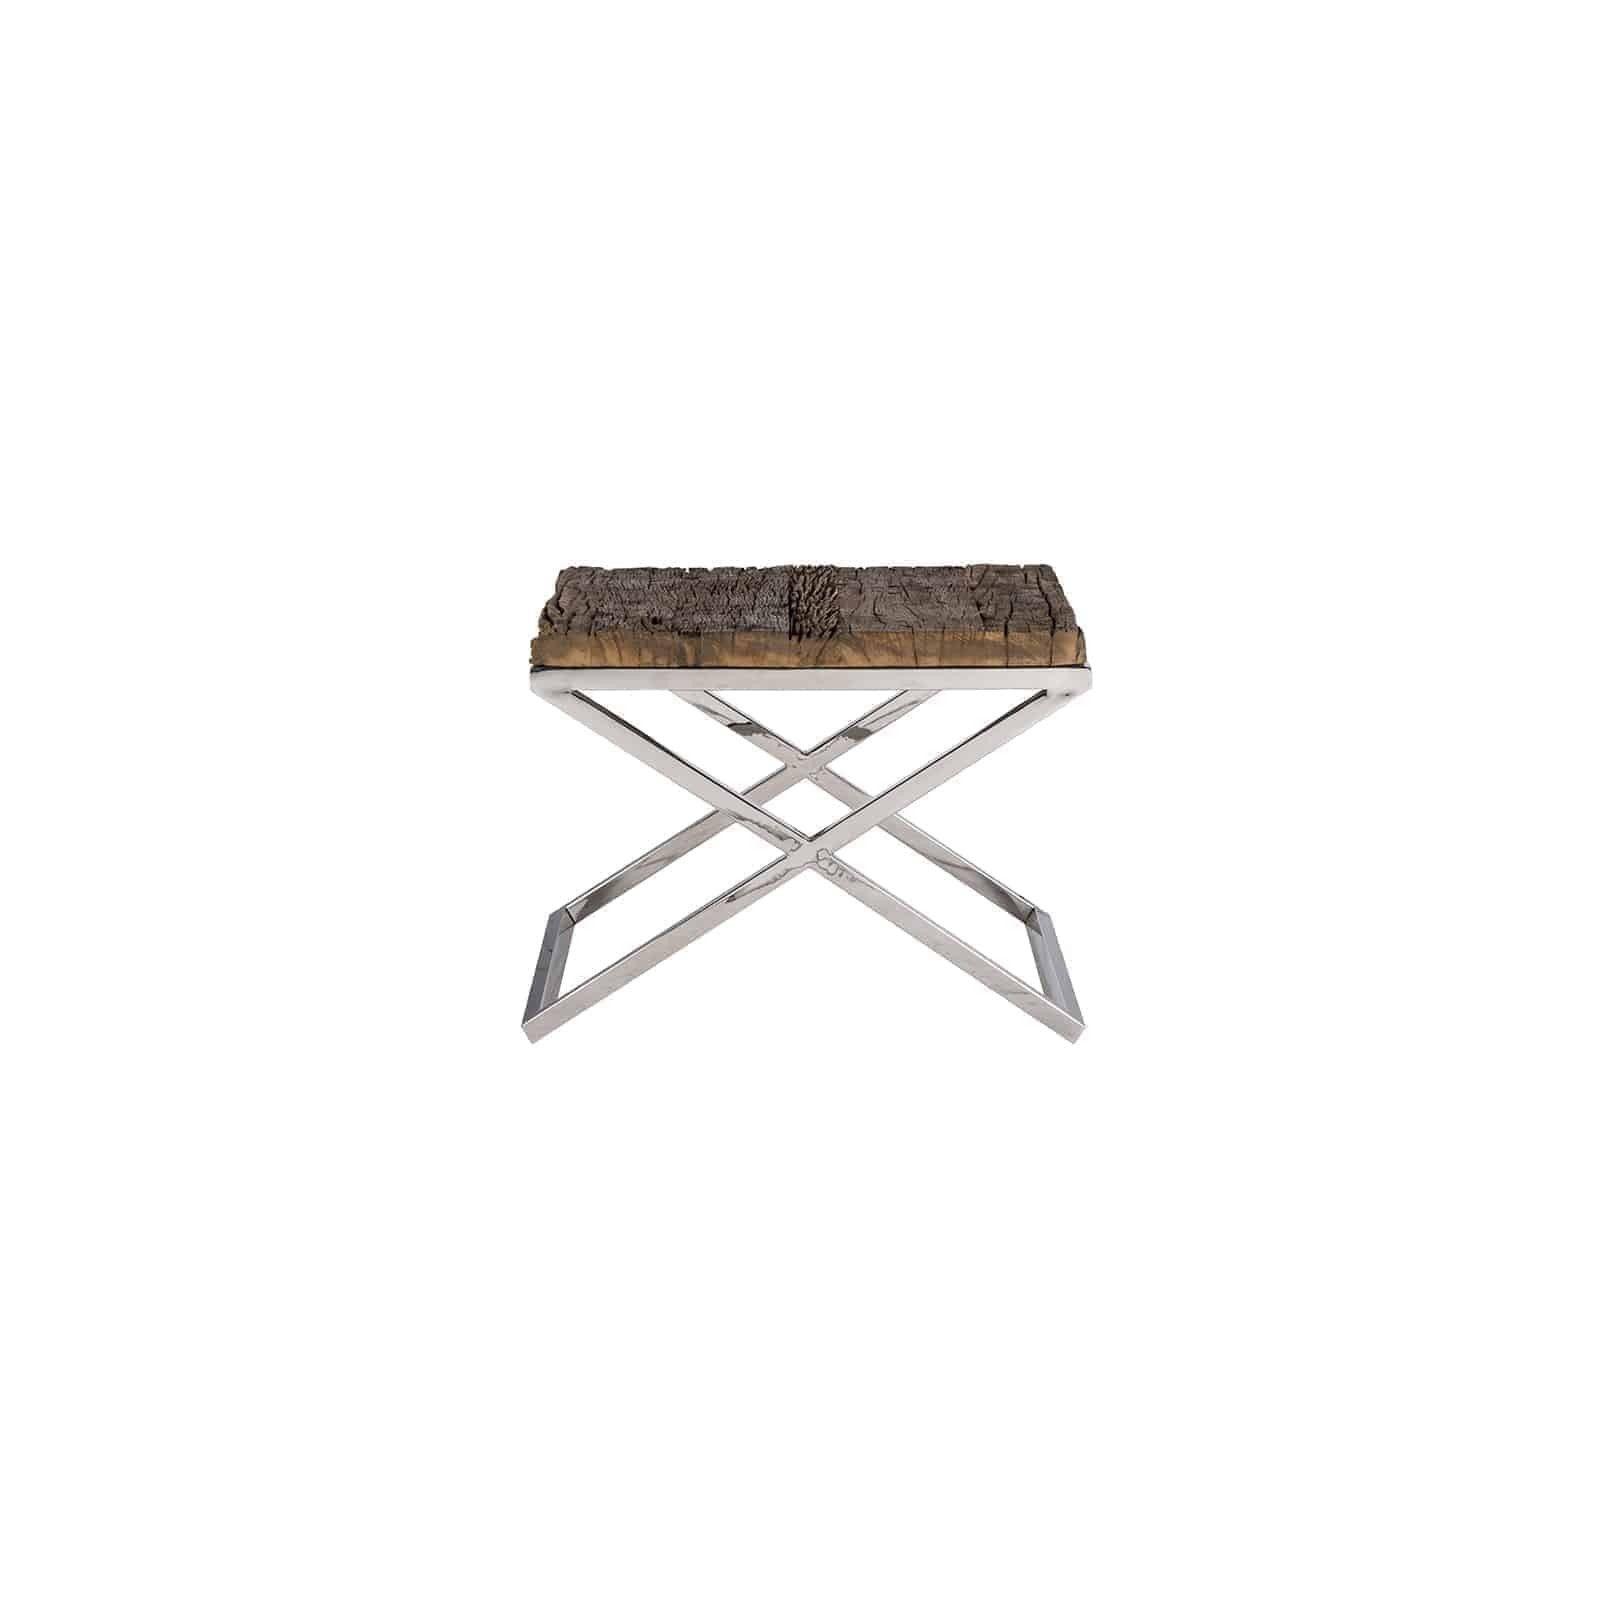 Table d'angle Kensington 60x60 Meuble Déco Tendance - 243